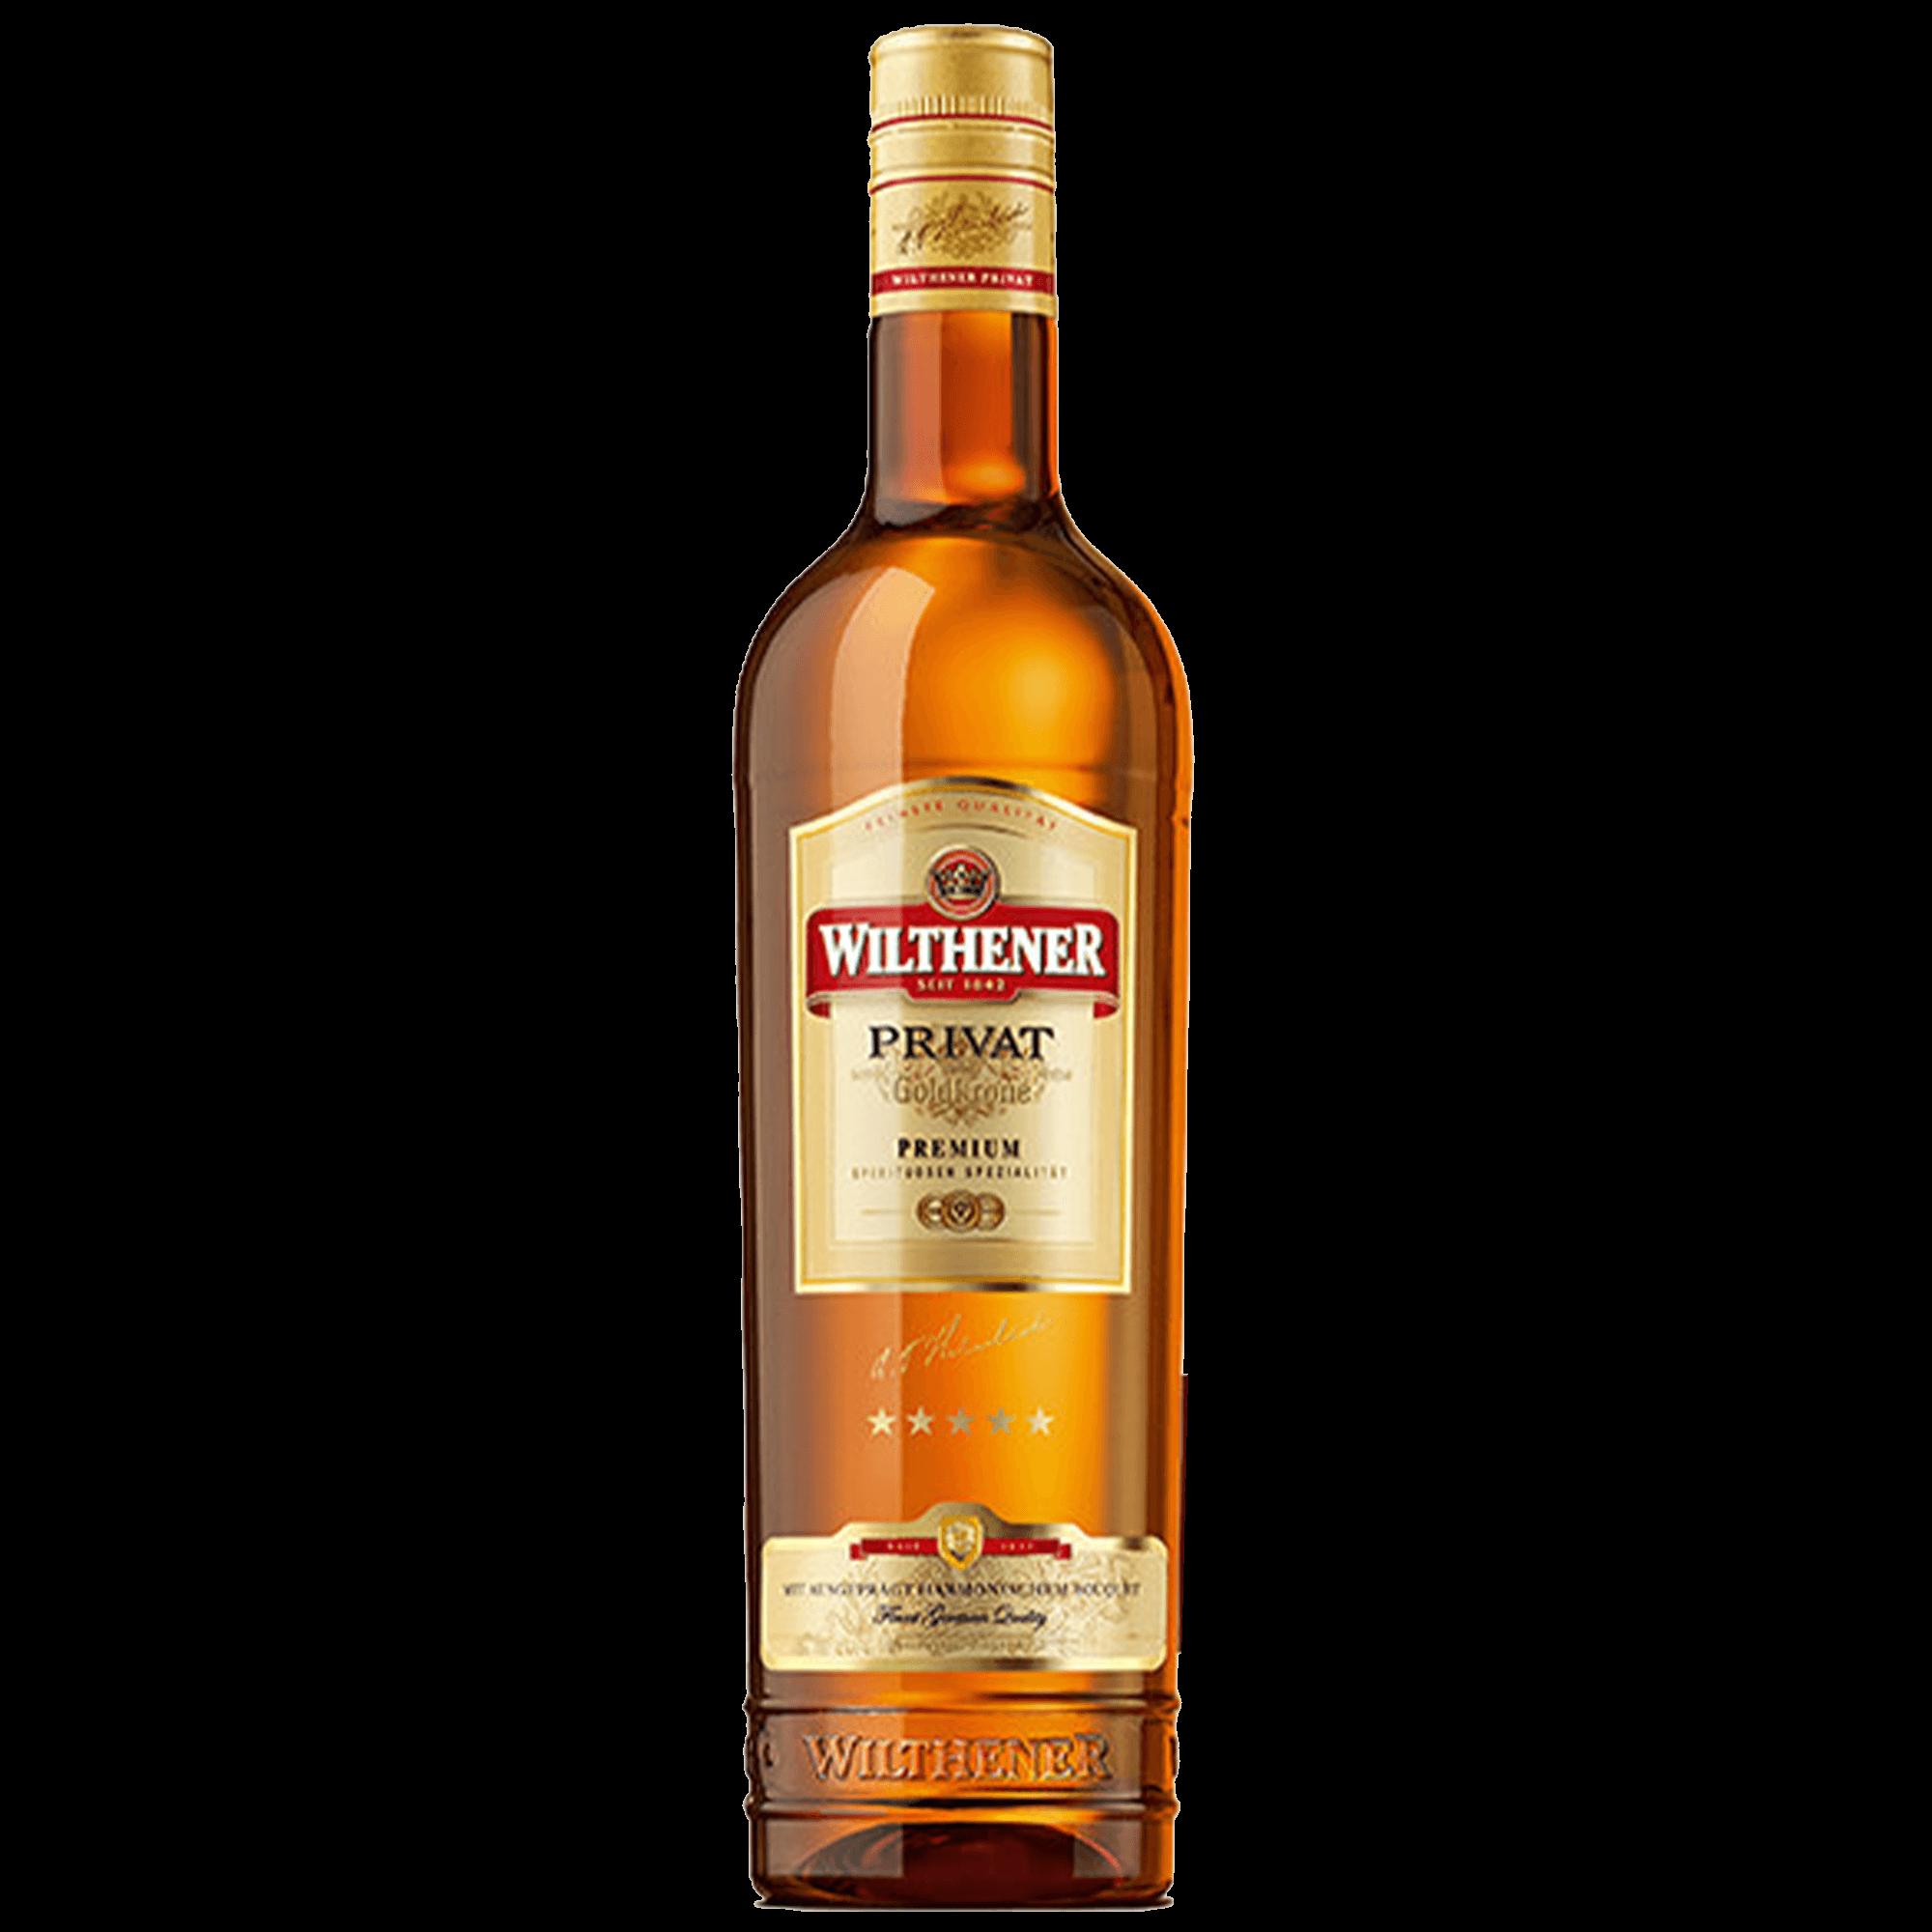 Wilthener Goldkrone Privat 0,7l